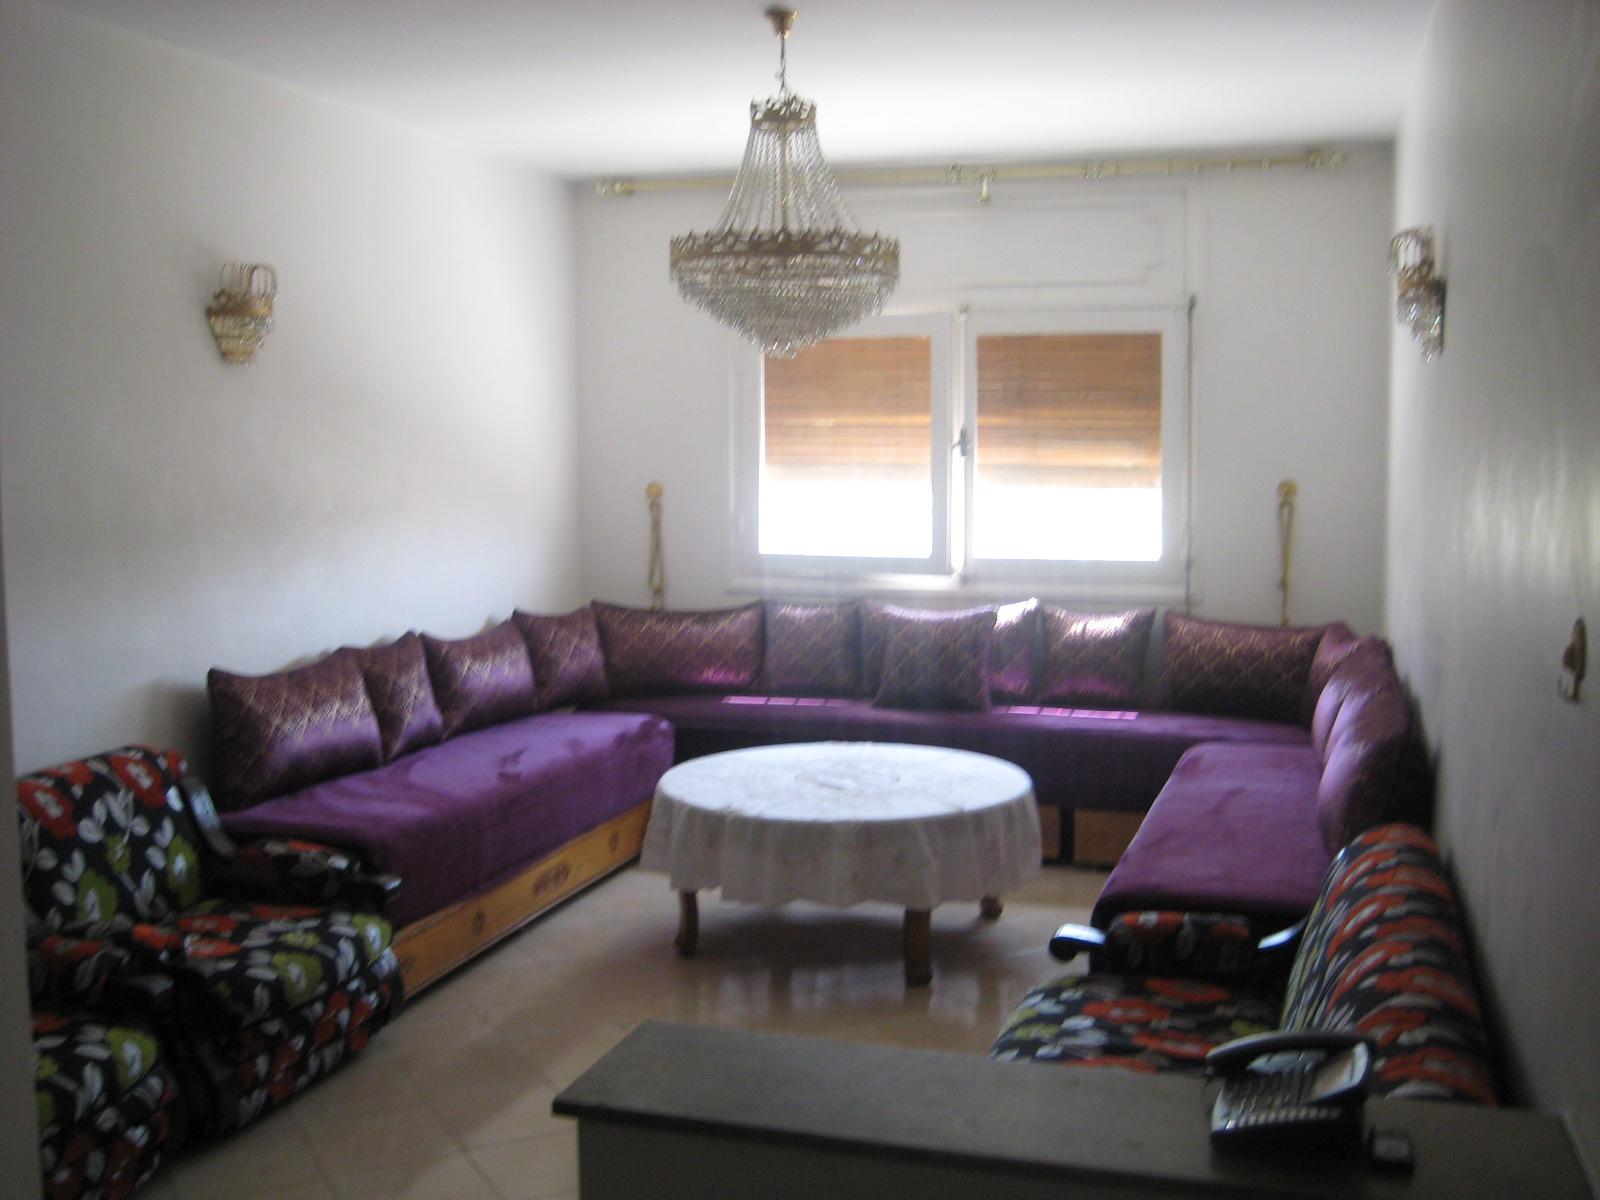 Appartement à vendre à rabat sale maroc residence vente ...